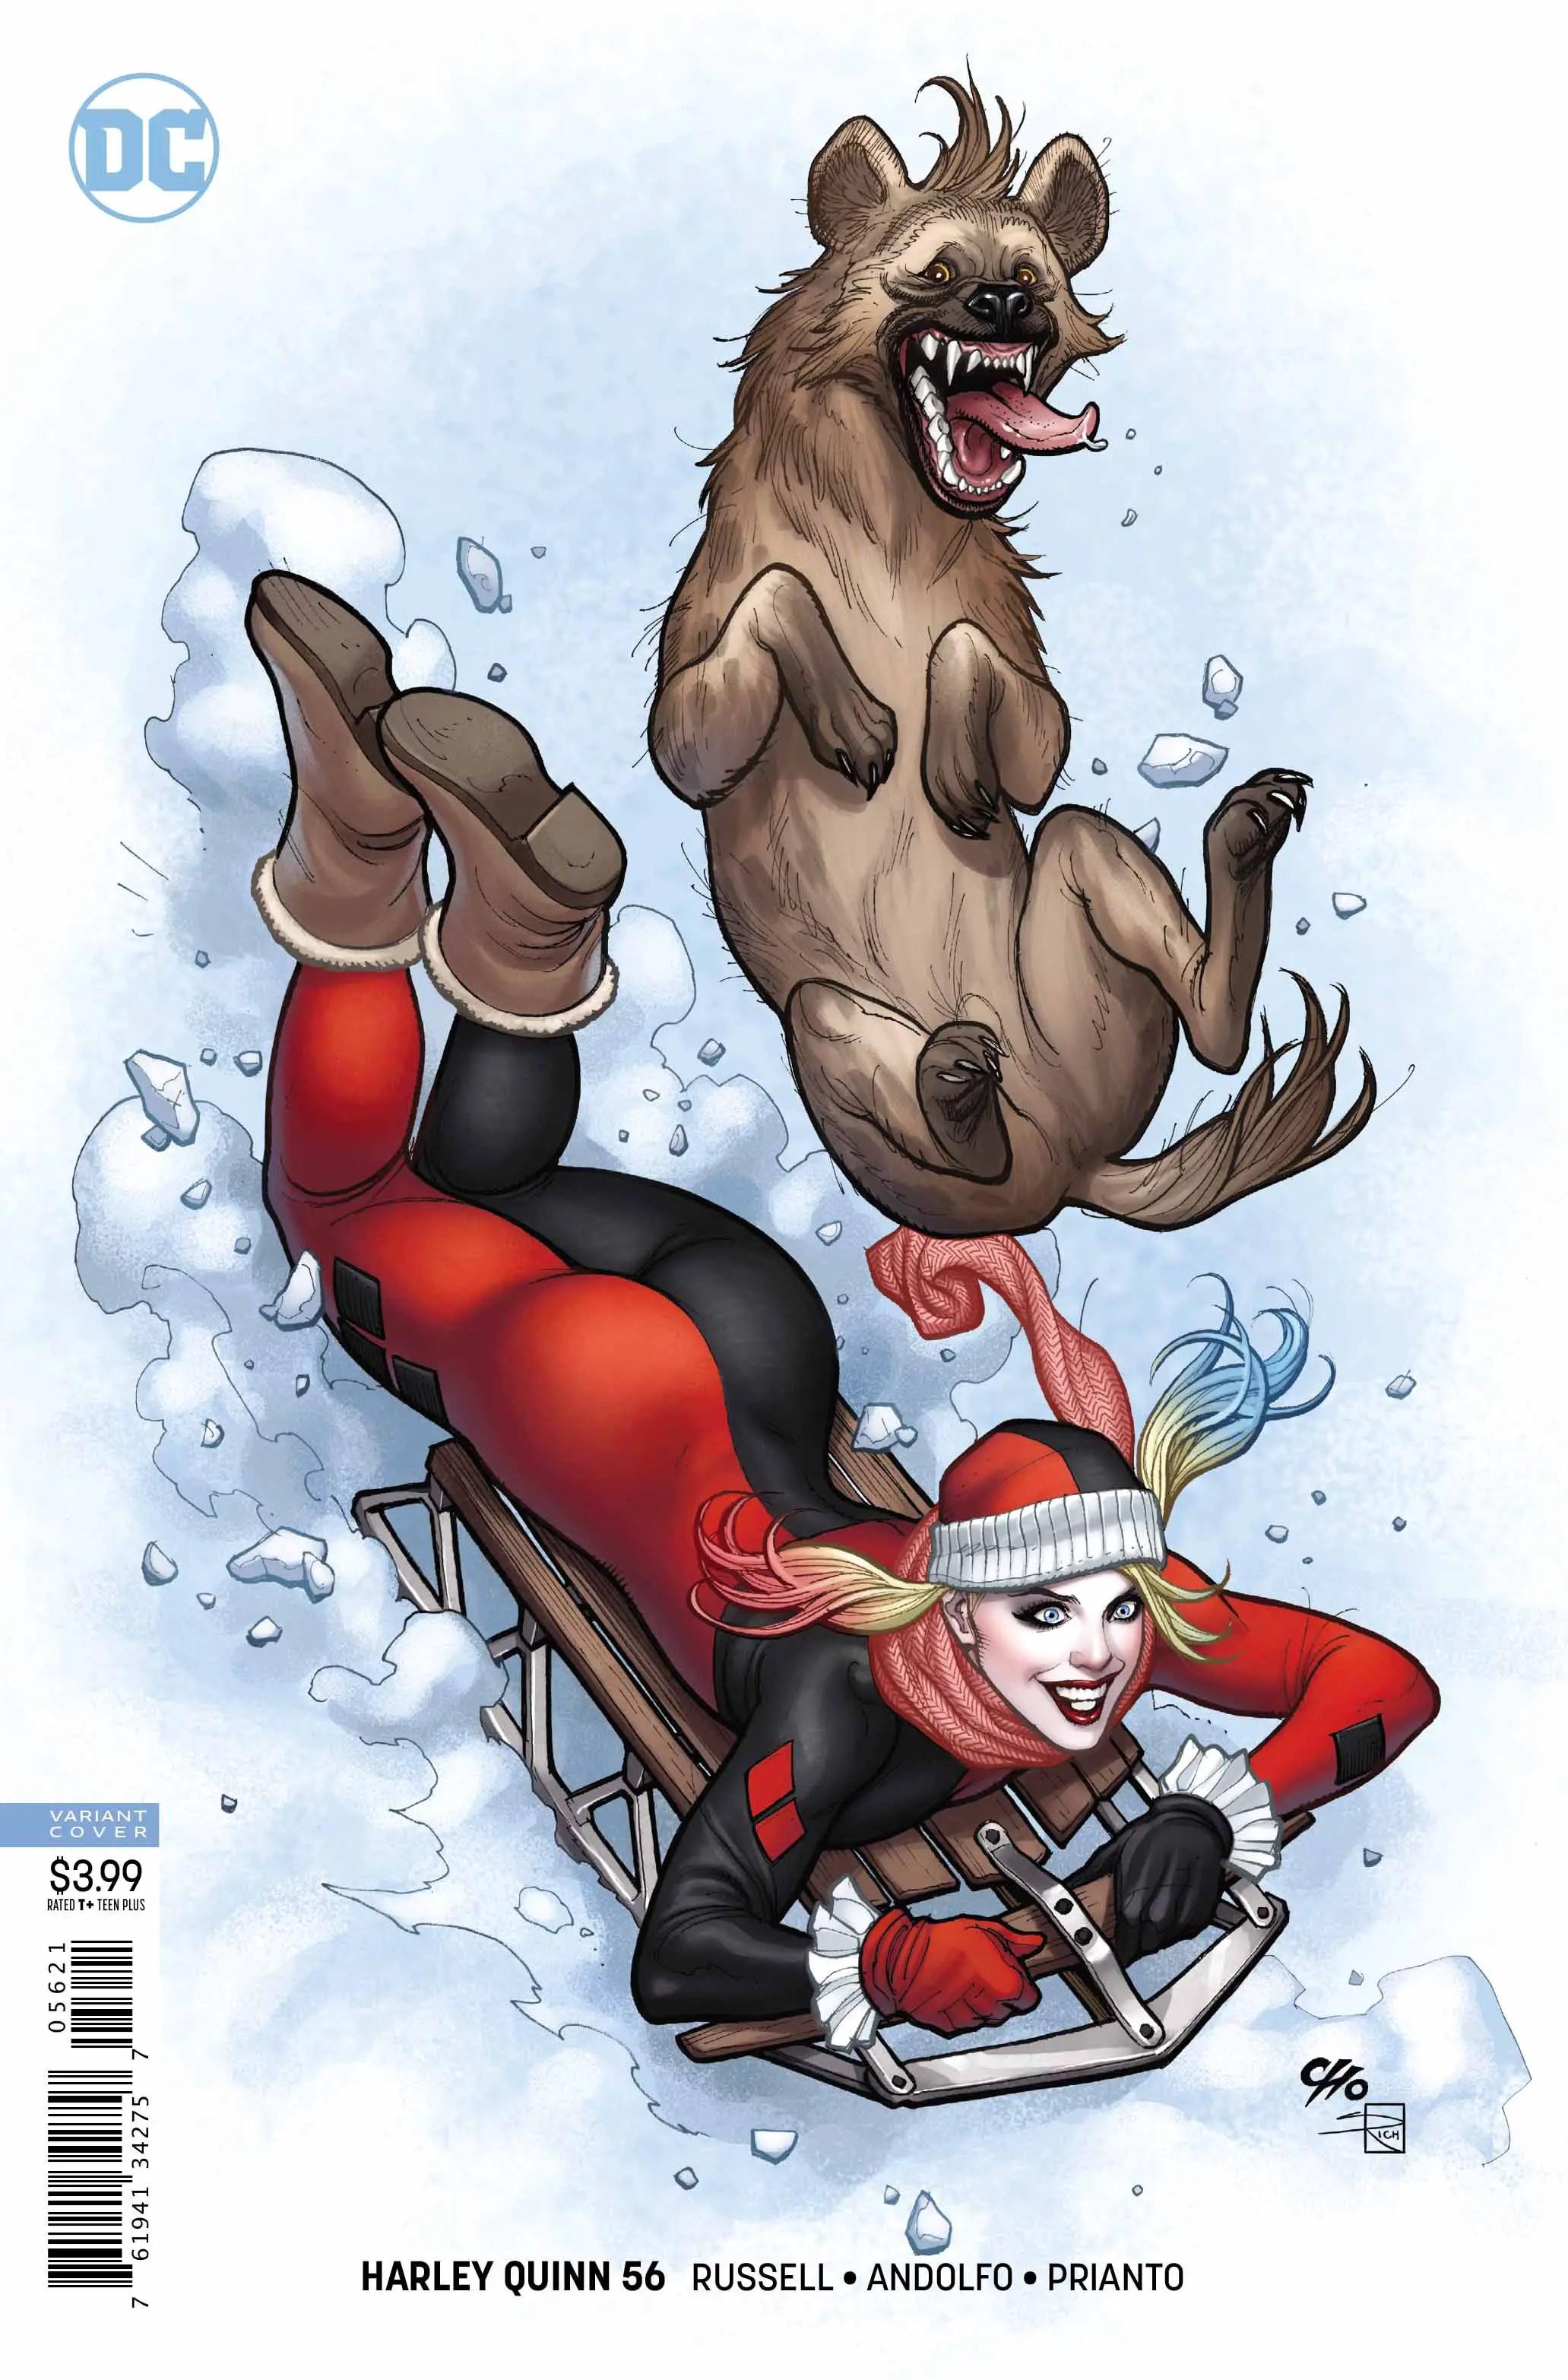 Harley Quinn #56 Review